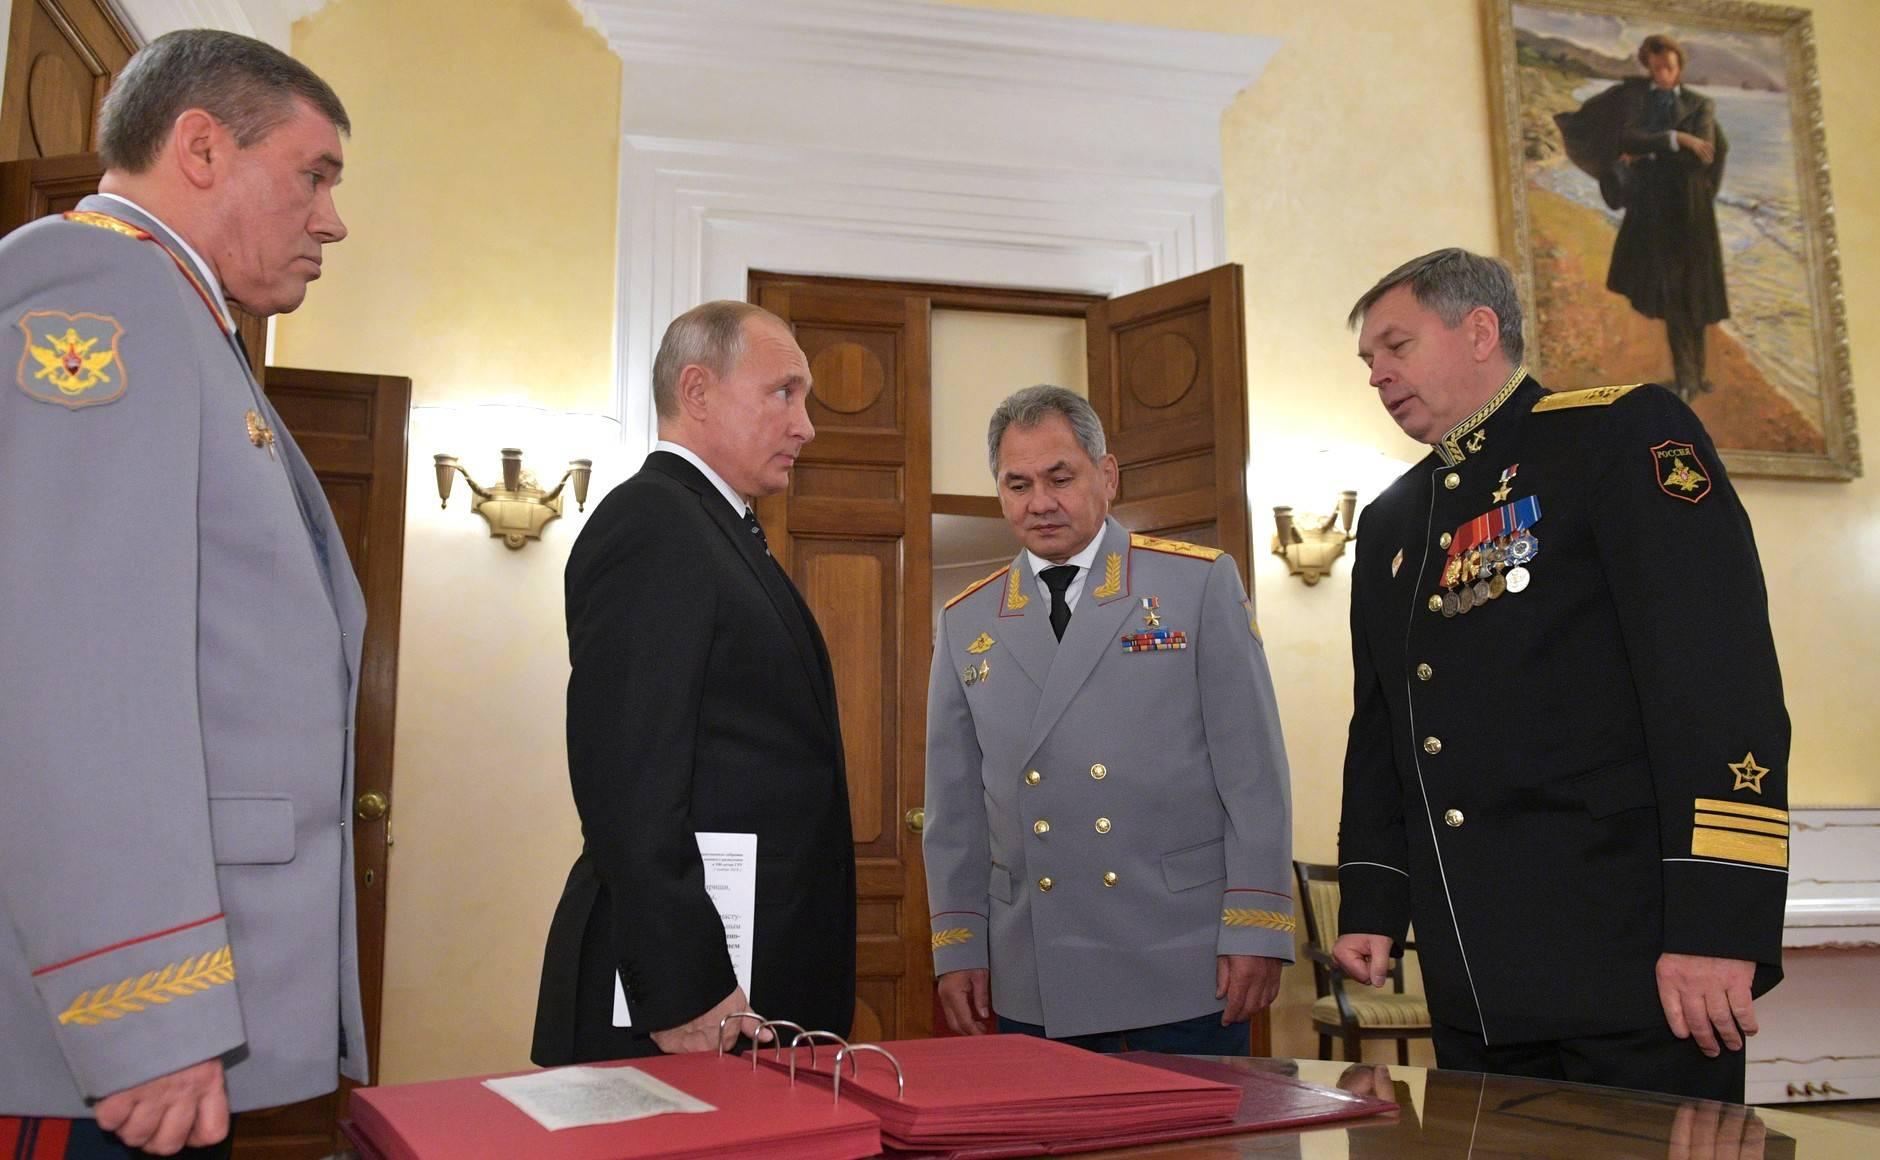 Игор Костюков, директор на ГРУ, с Путин и военния министър Шойгу